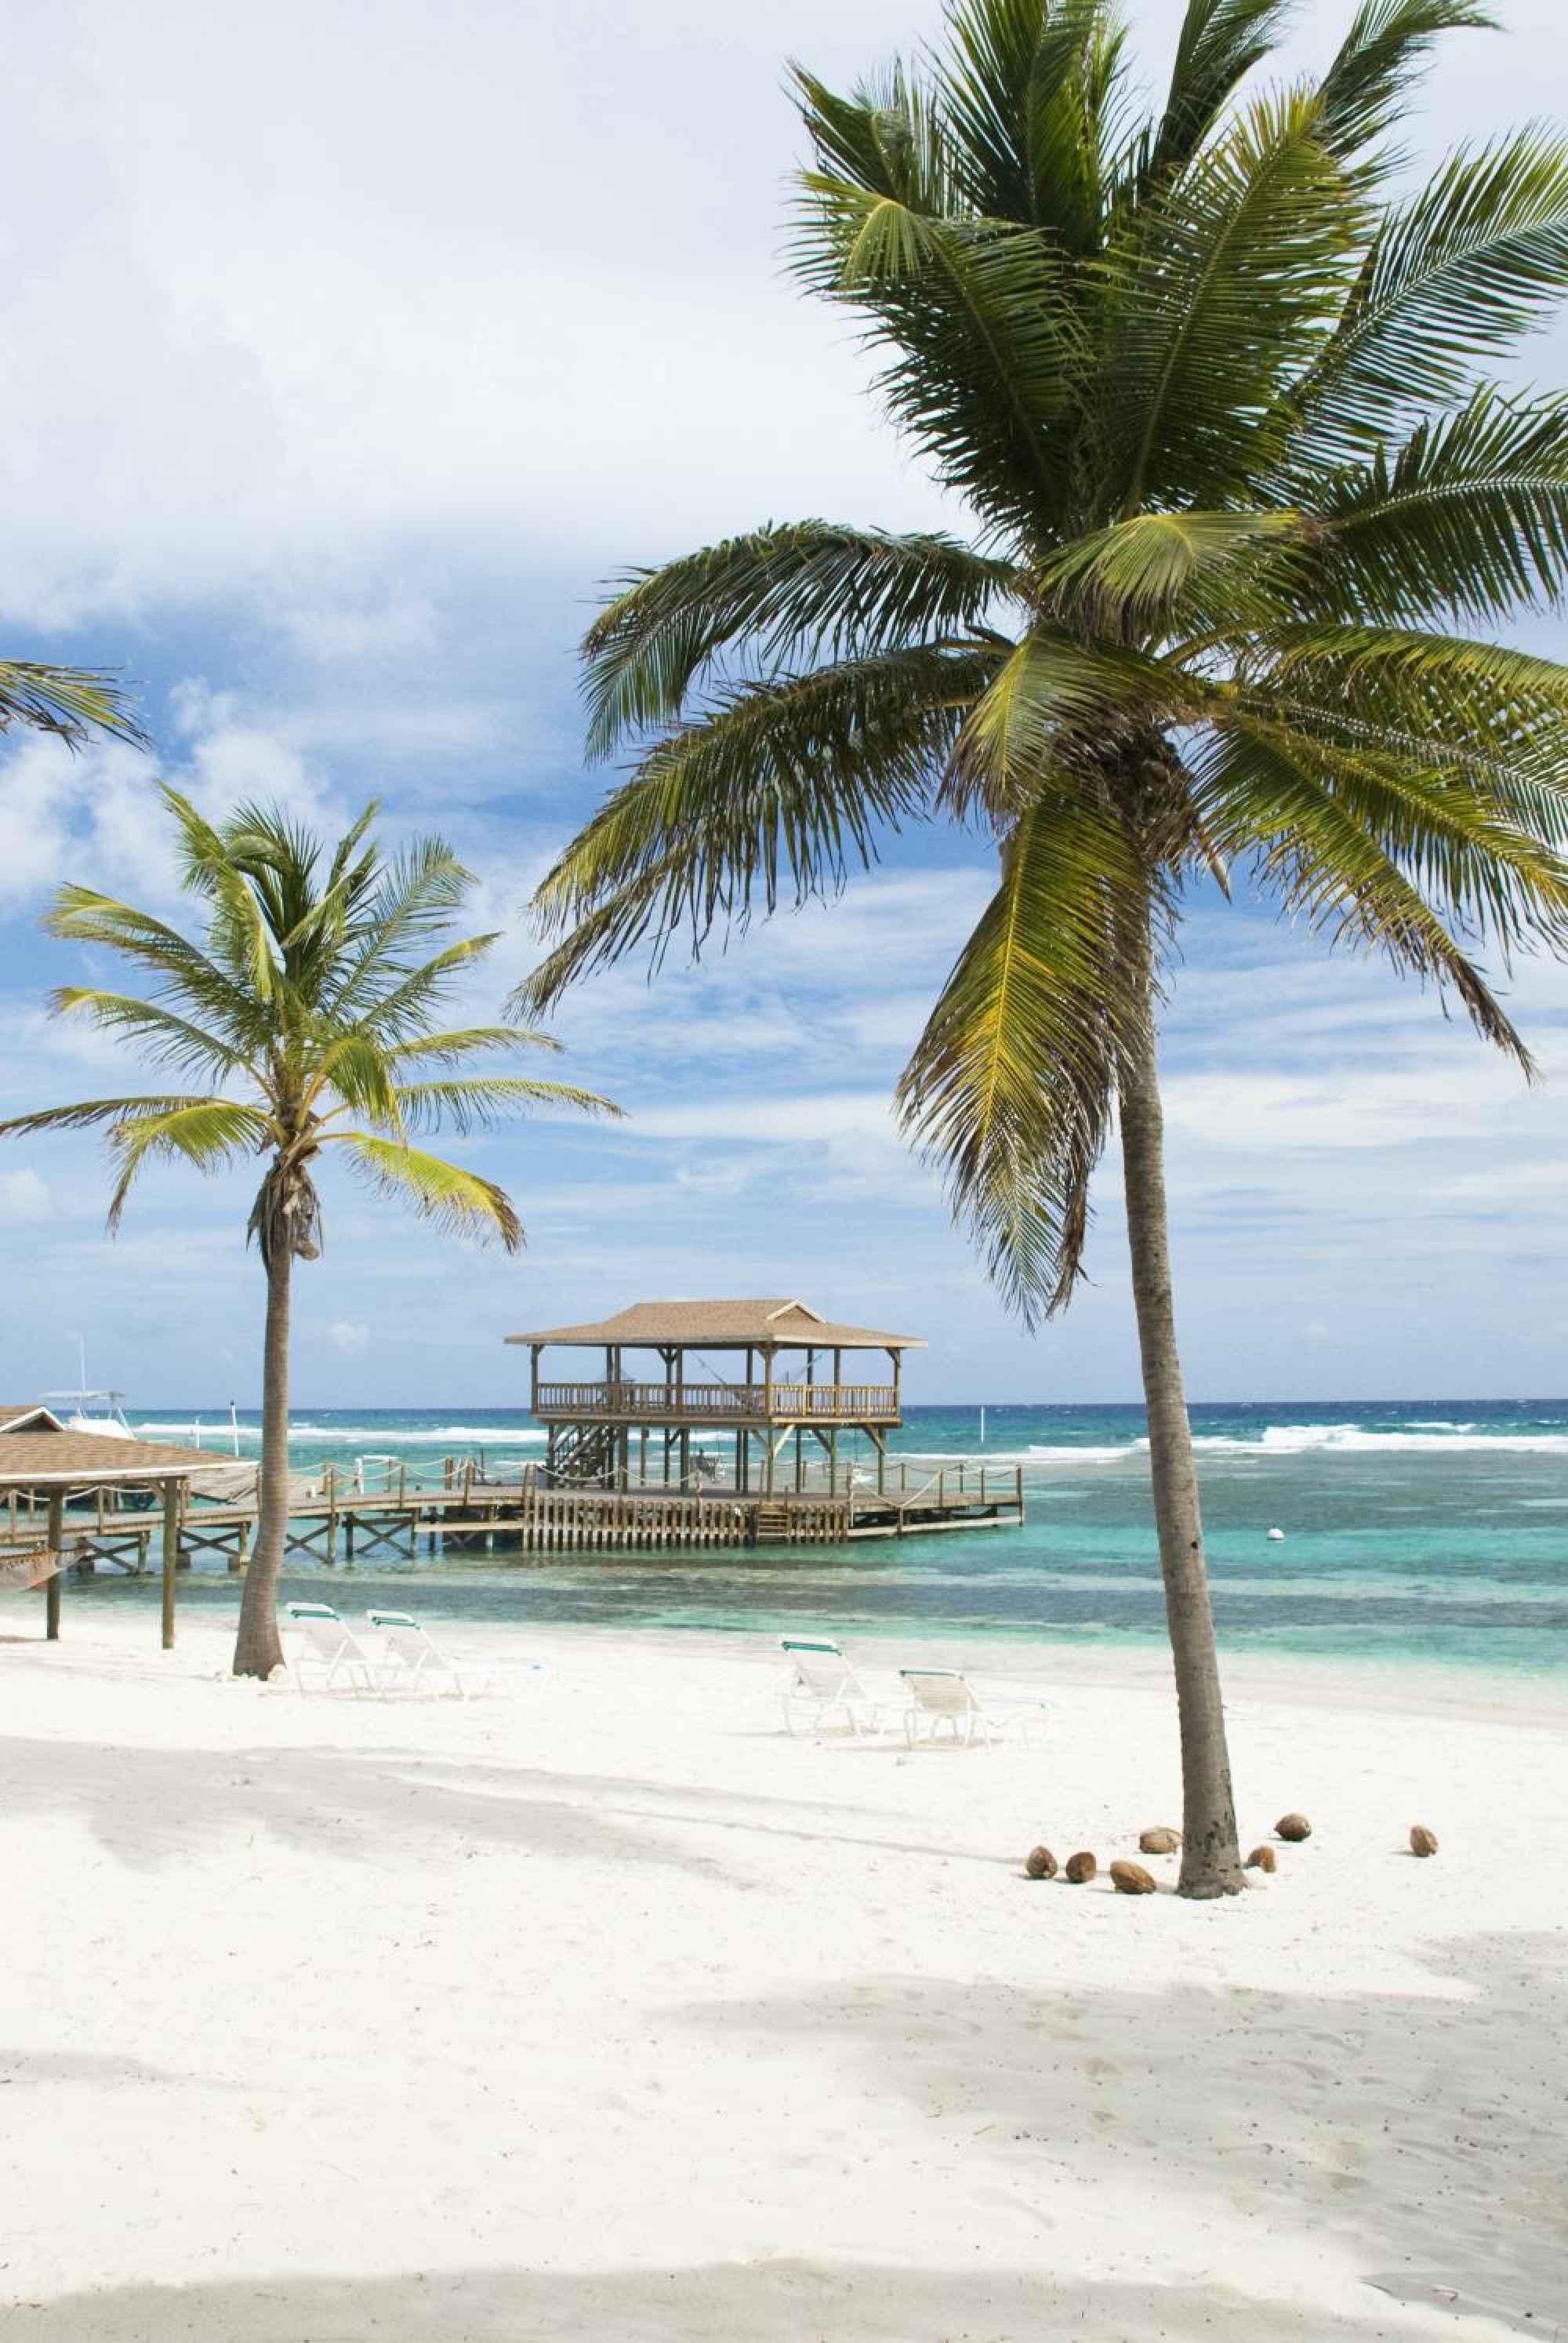 2. Caribbean